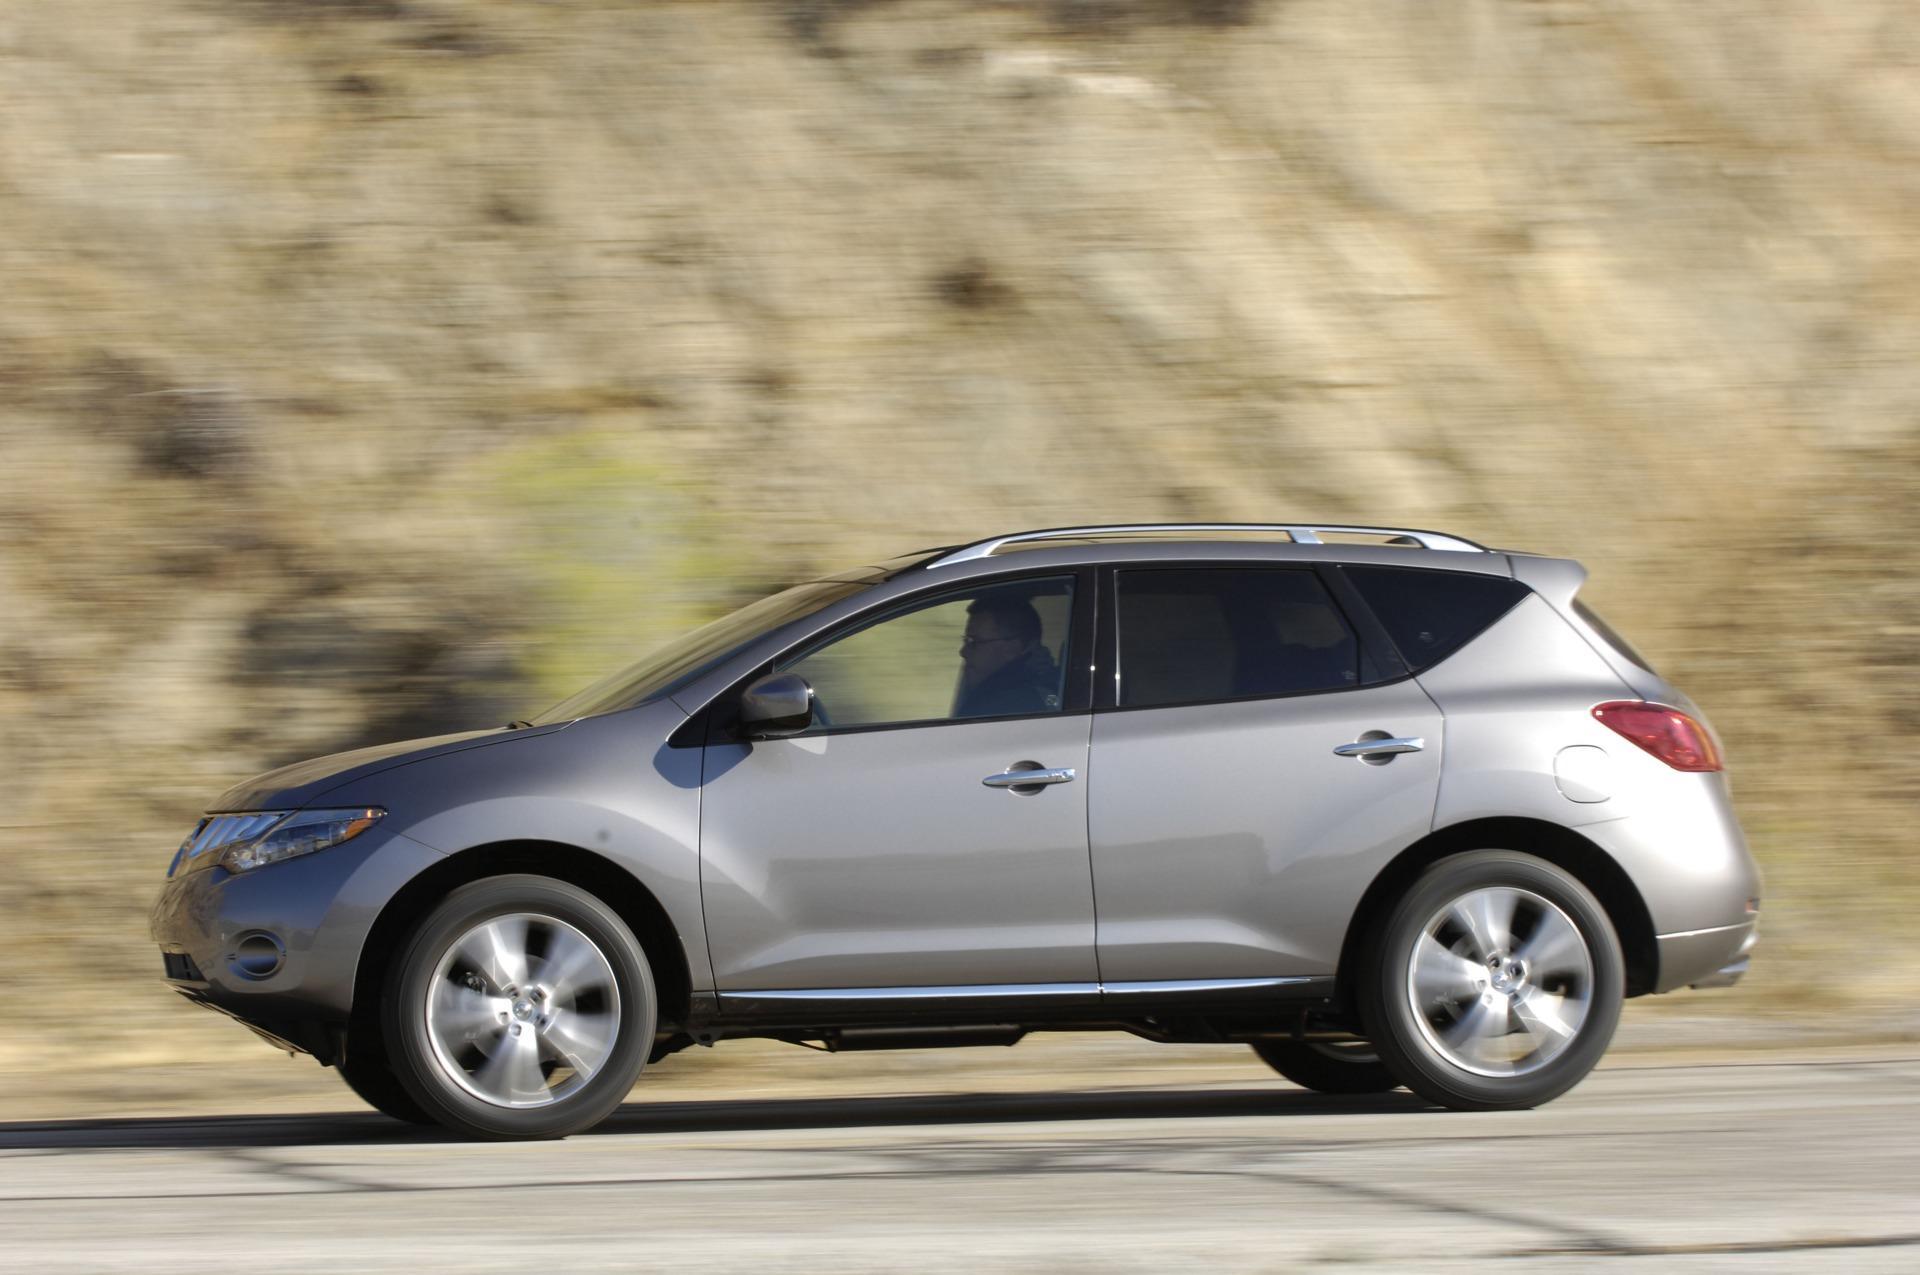 2009 Nissan Murano News And Information Conceptcarz Com